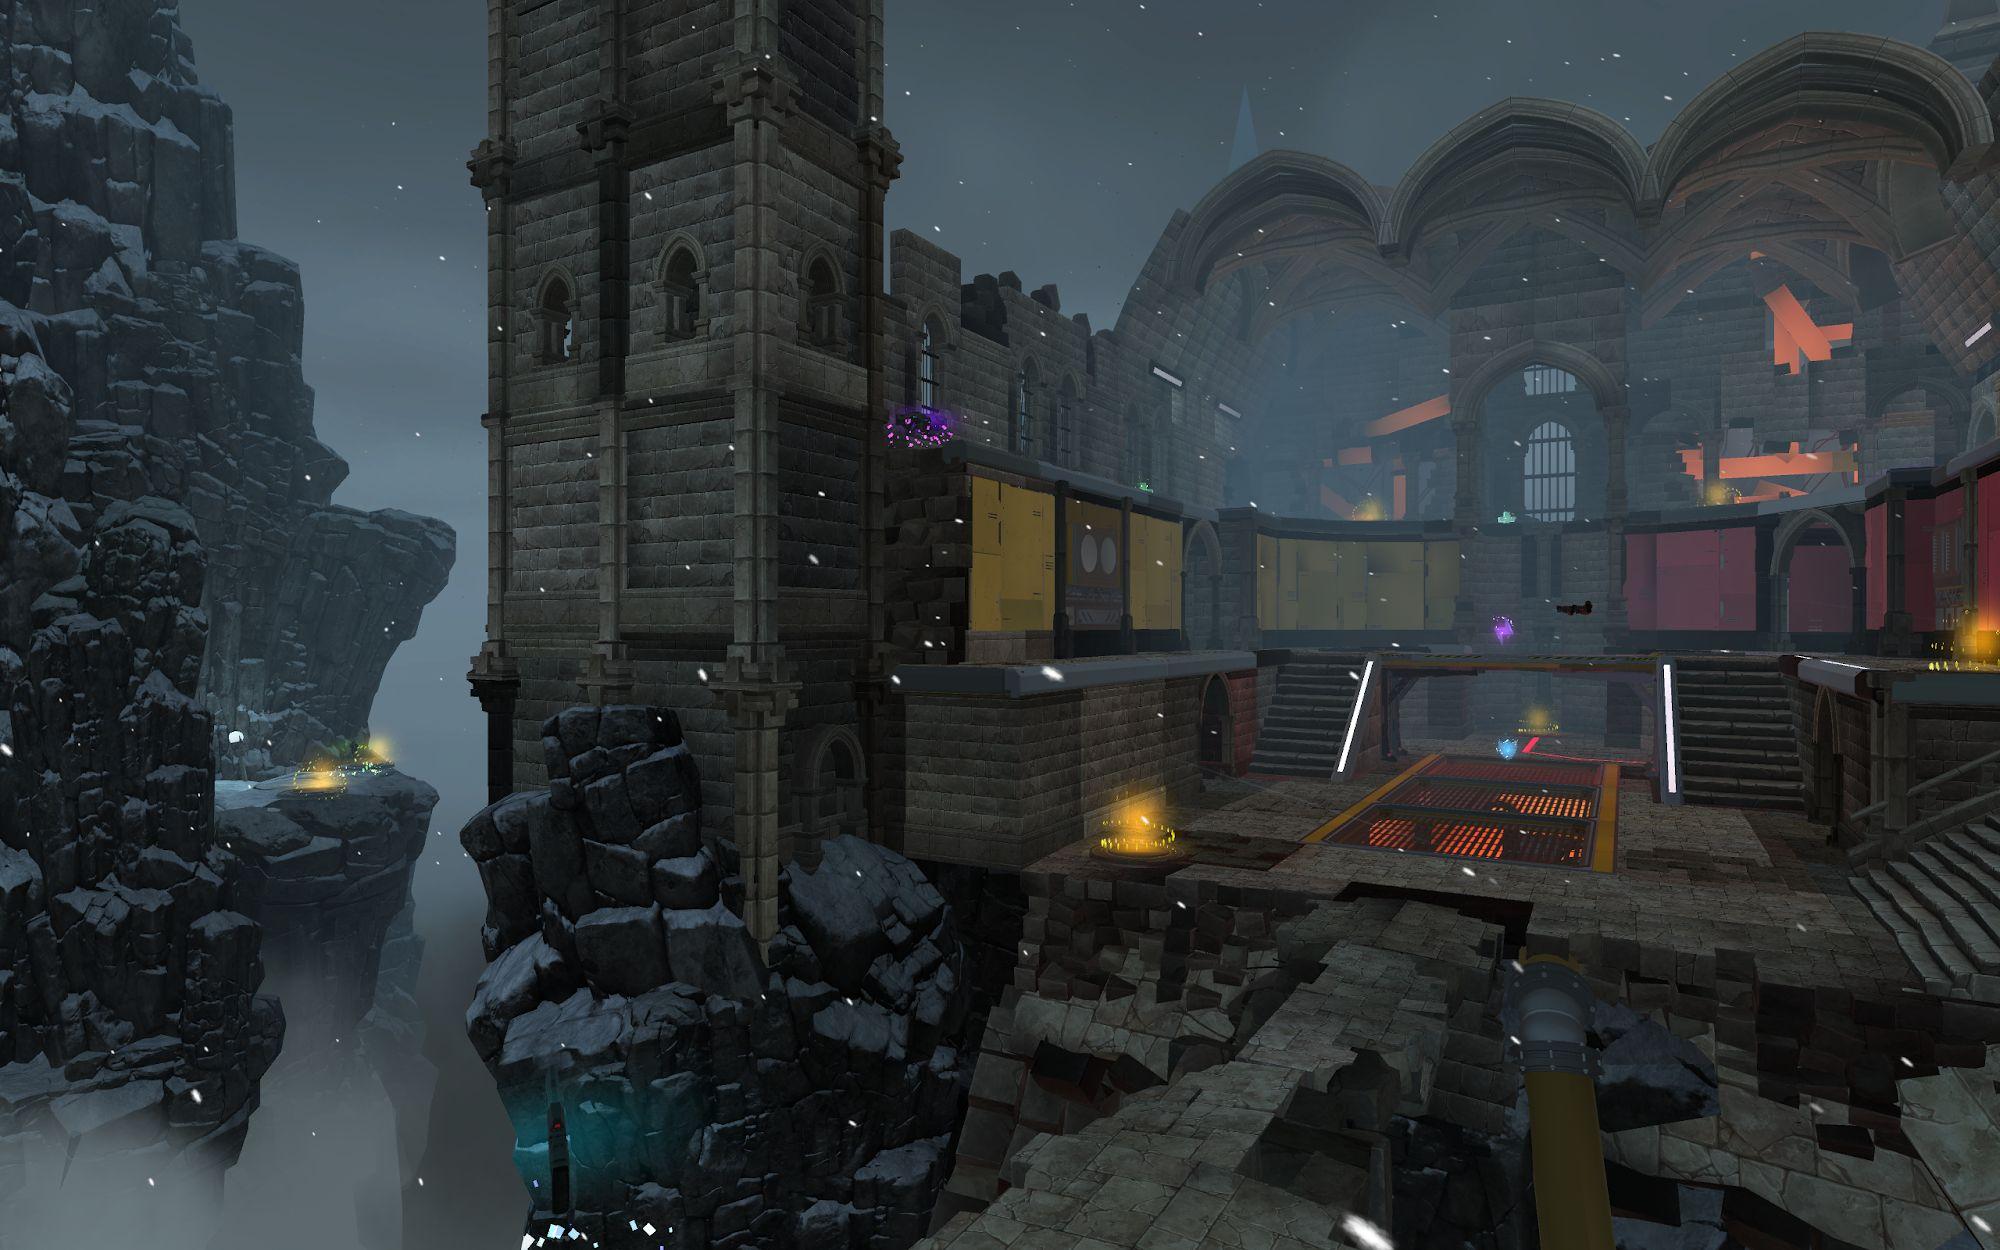 Hellfire - Multiplayer Arena FPS captura de tela 1